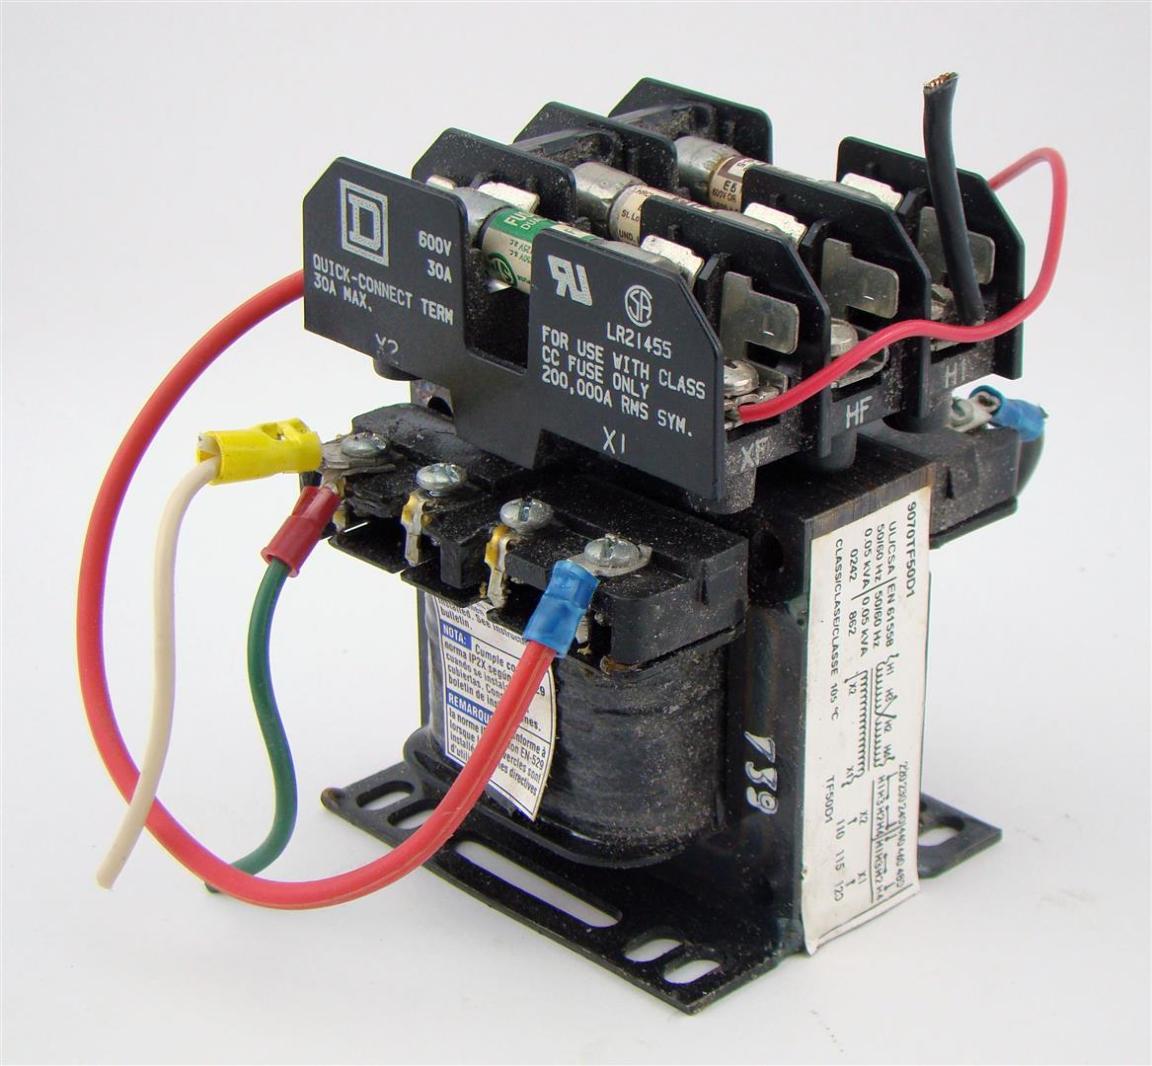 square d 480v transformer wiring diagram circuit breaker industrial control